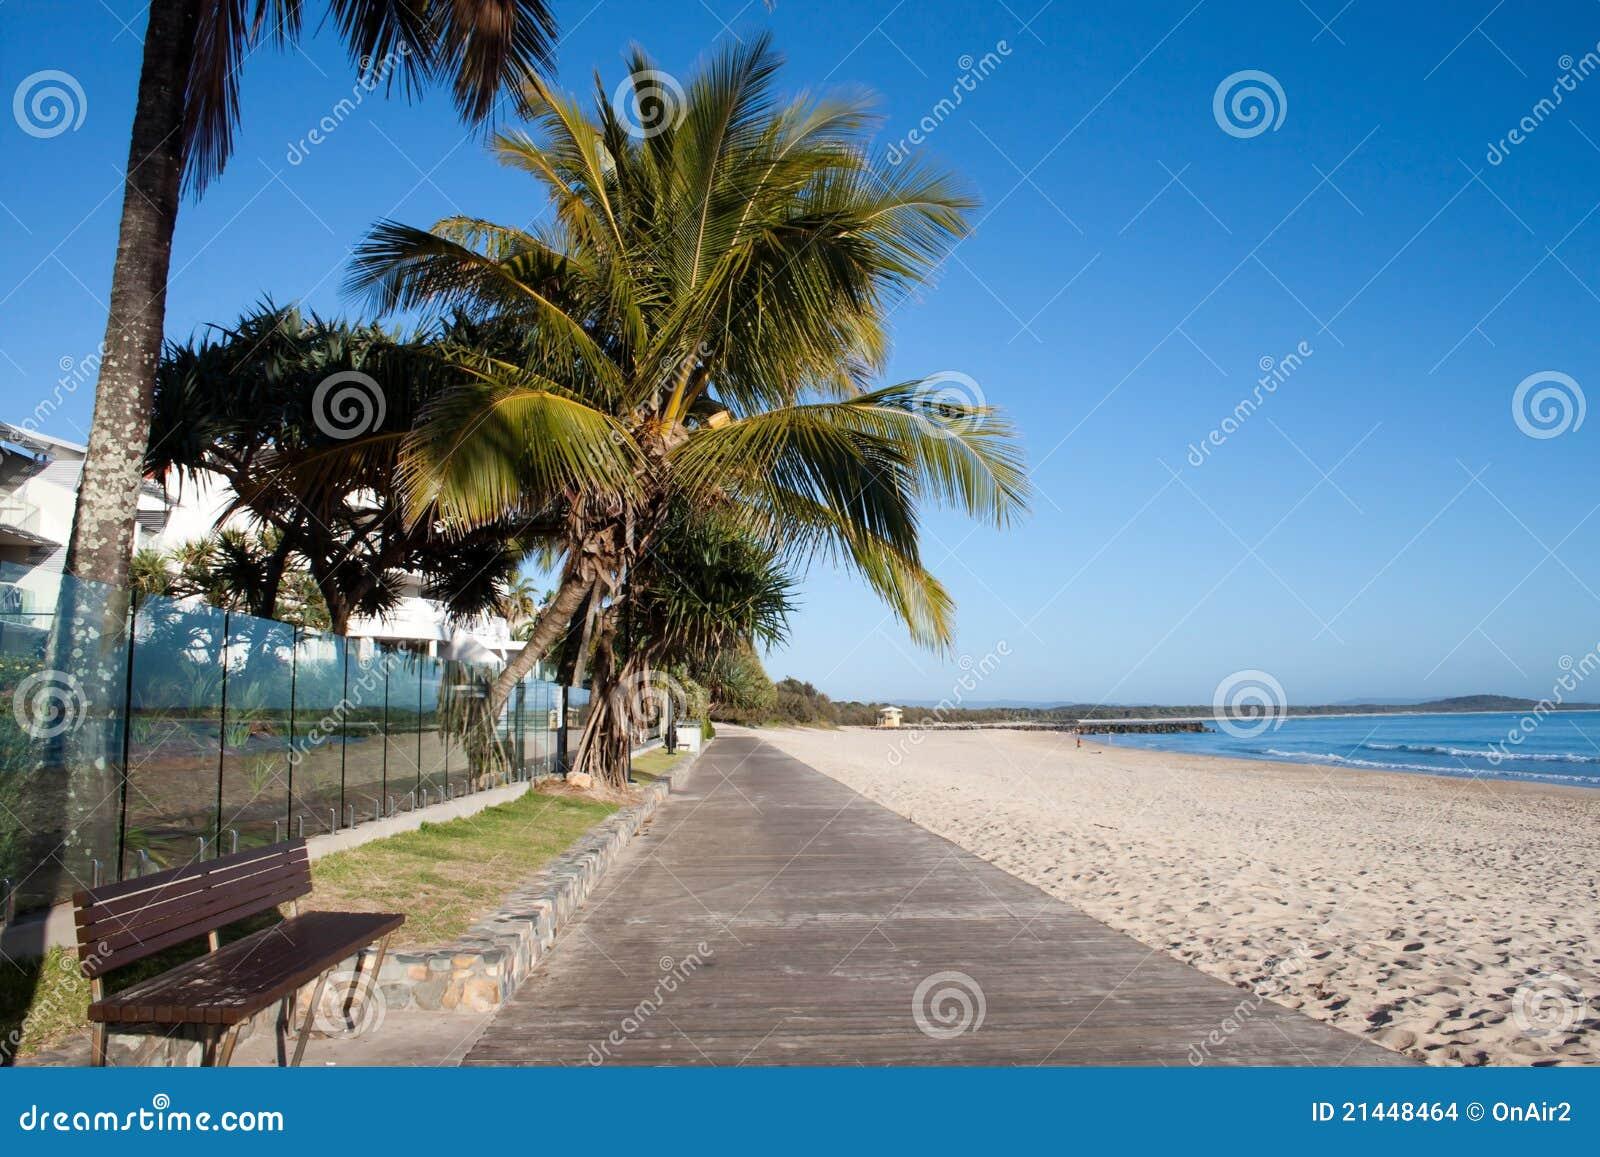 Noosa Boardwalk Stock Images - Image: 21448464